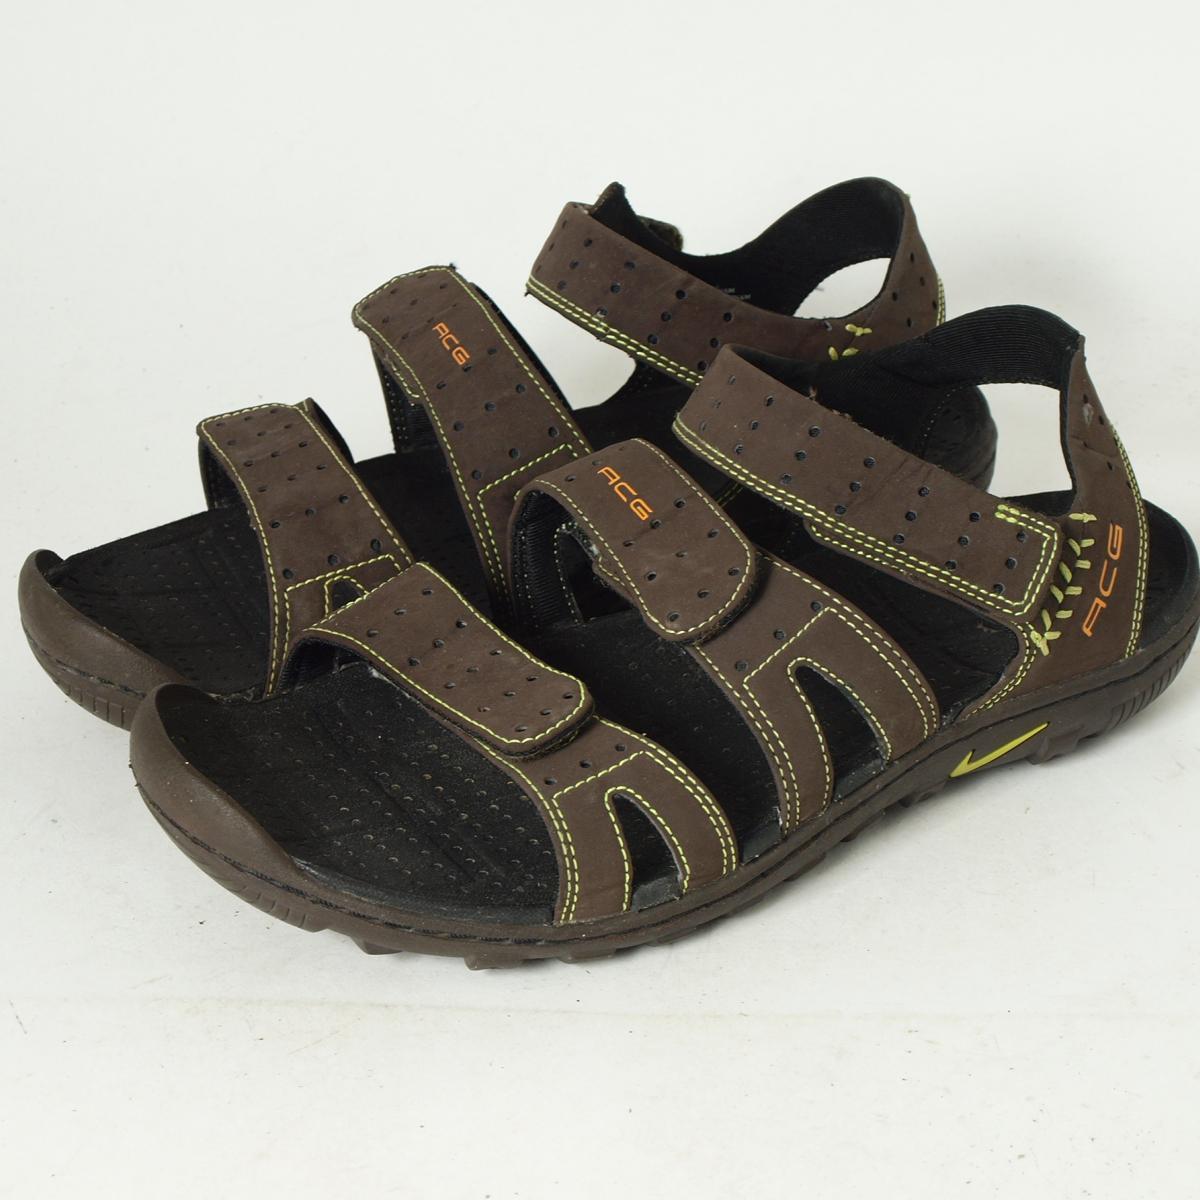 pantalon timberland pro - VINTAGE CLOTHING JAM TRADING | Rakuten Global Market: Nike ACG ...